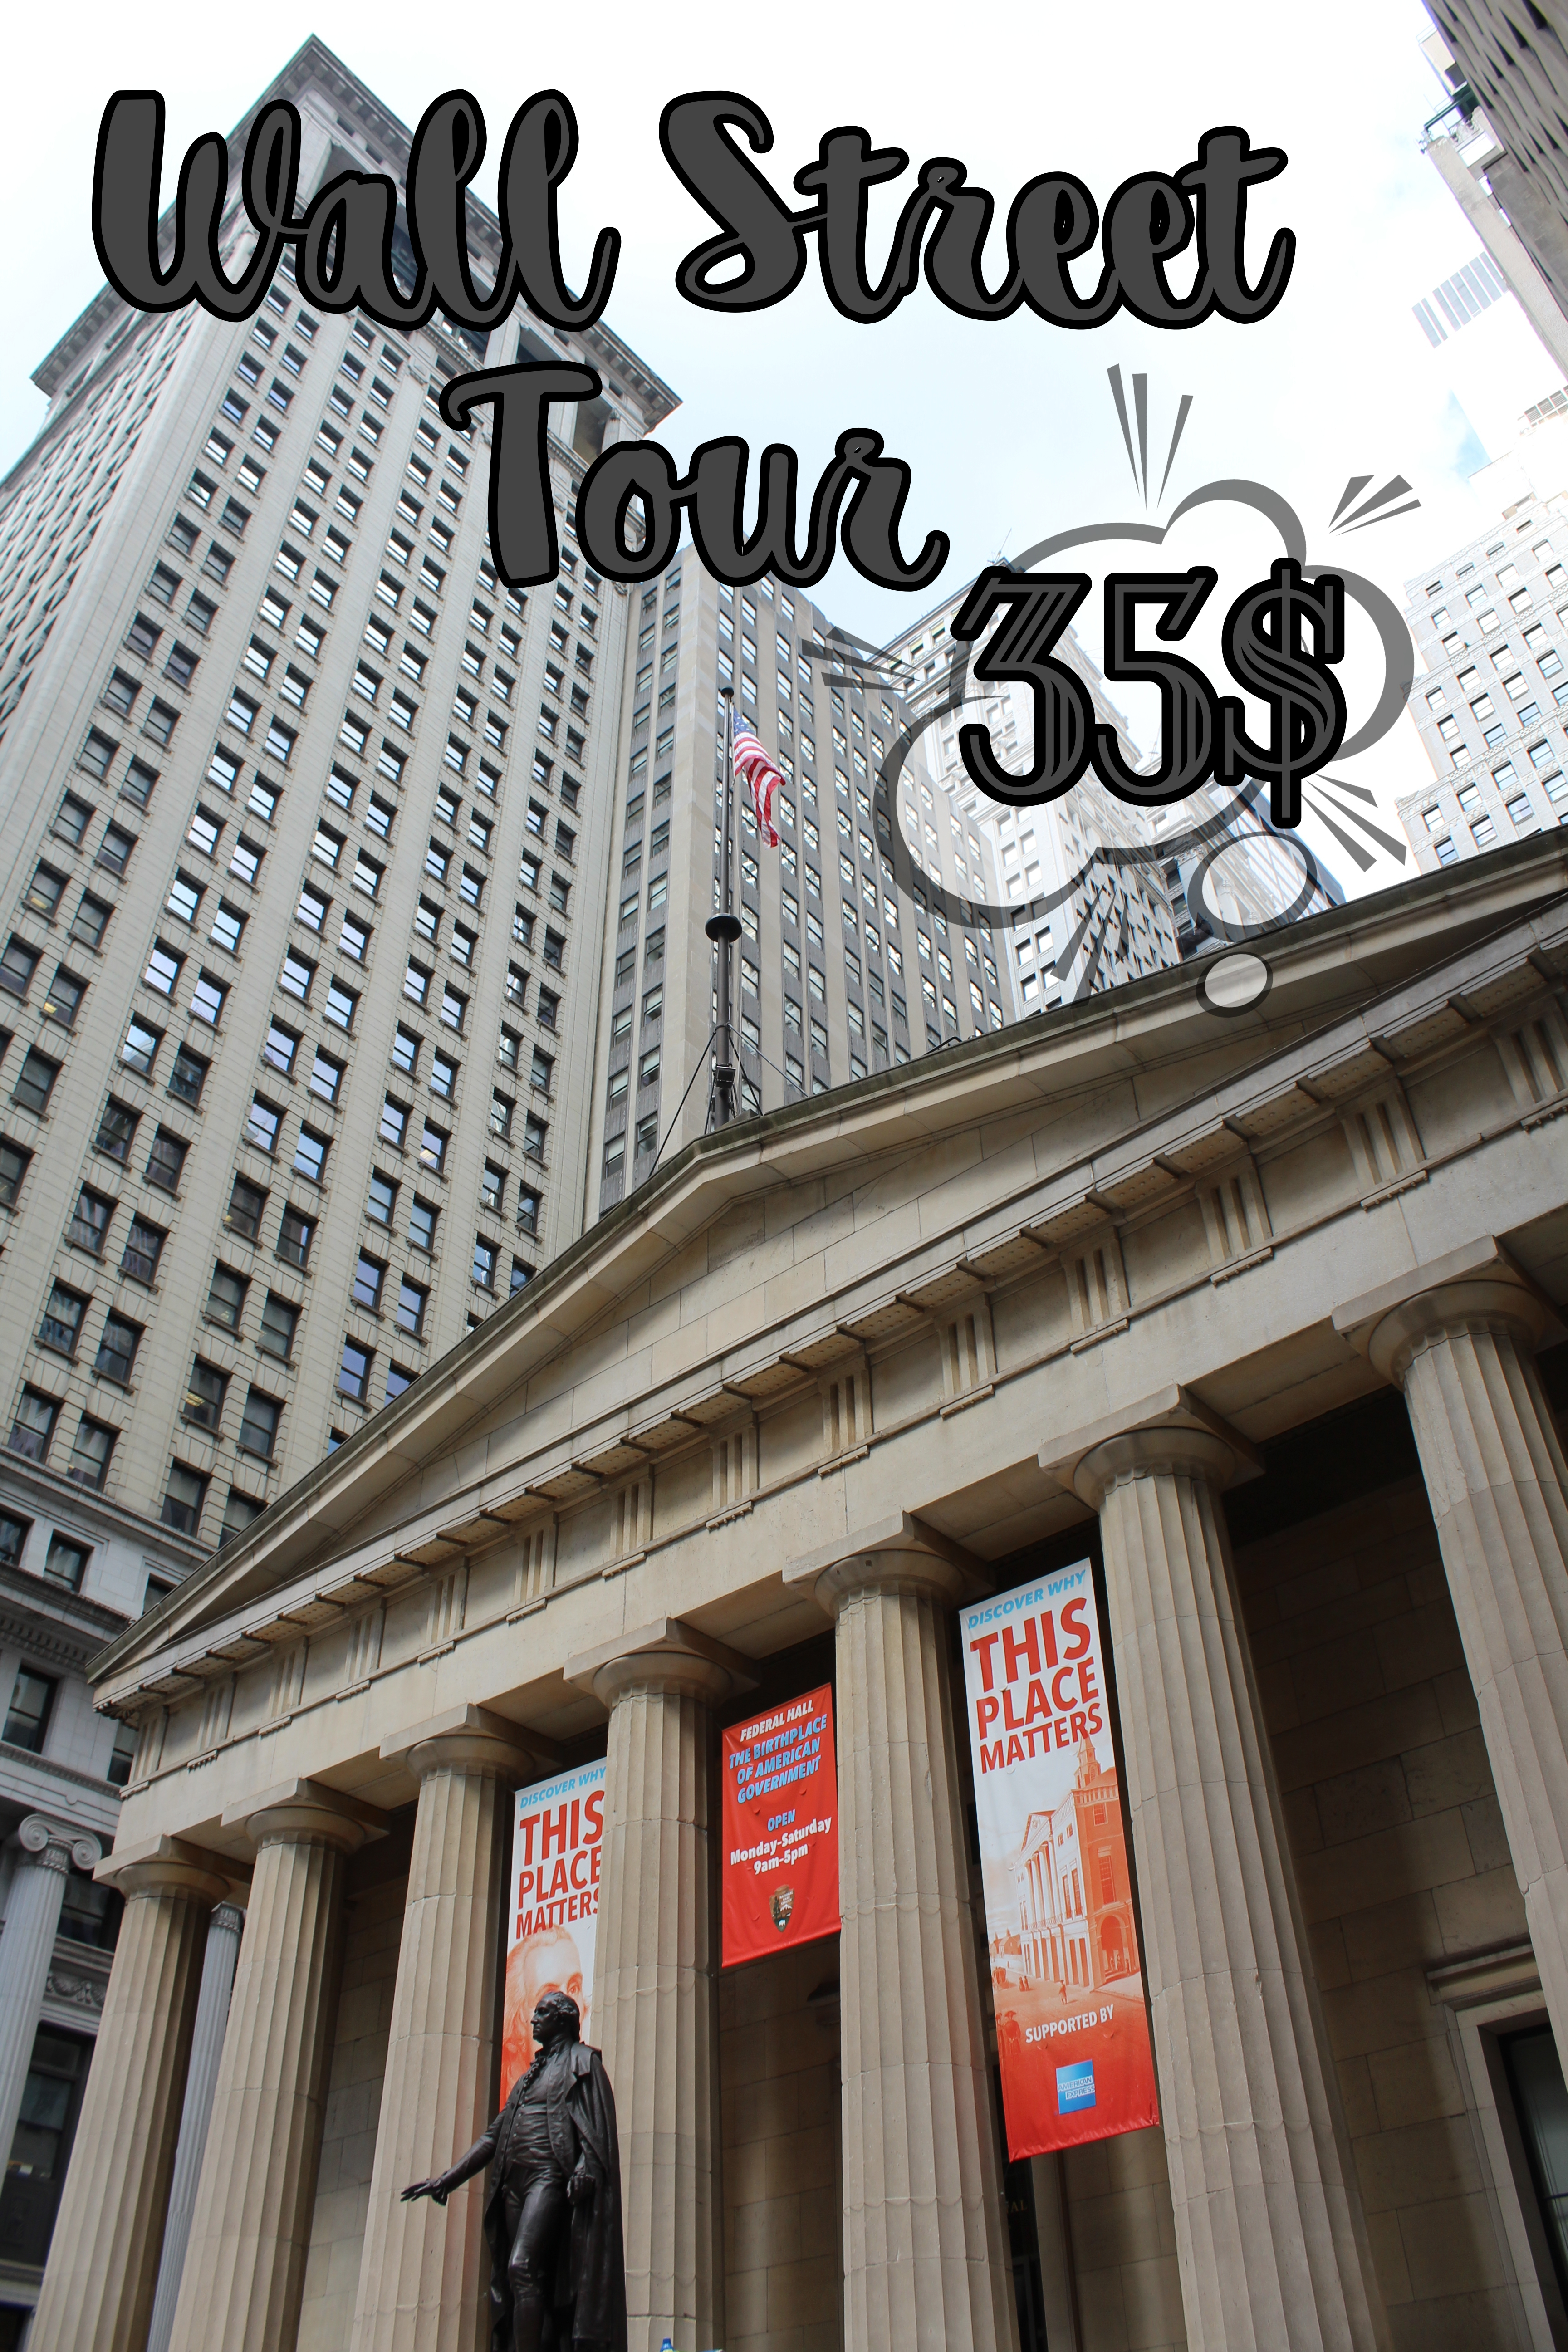 precio wall street tour